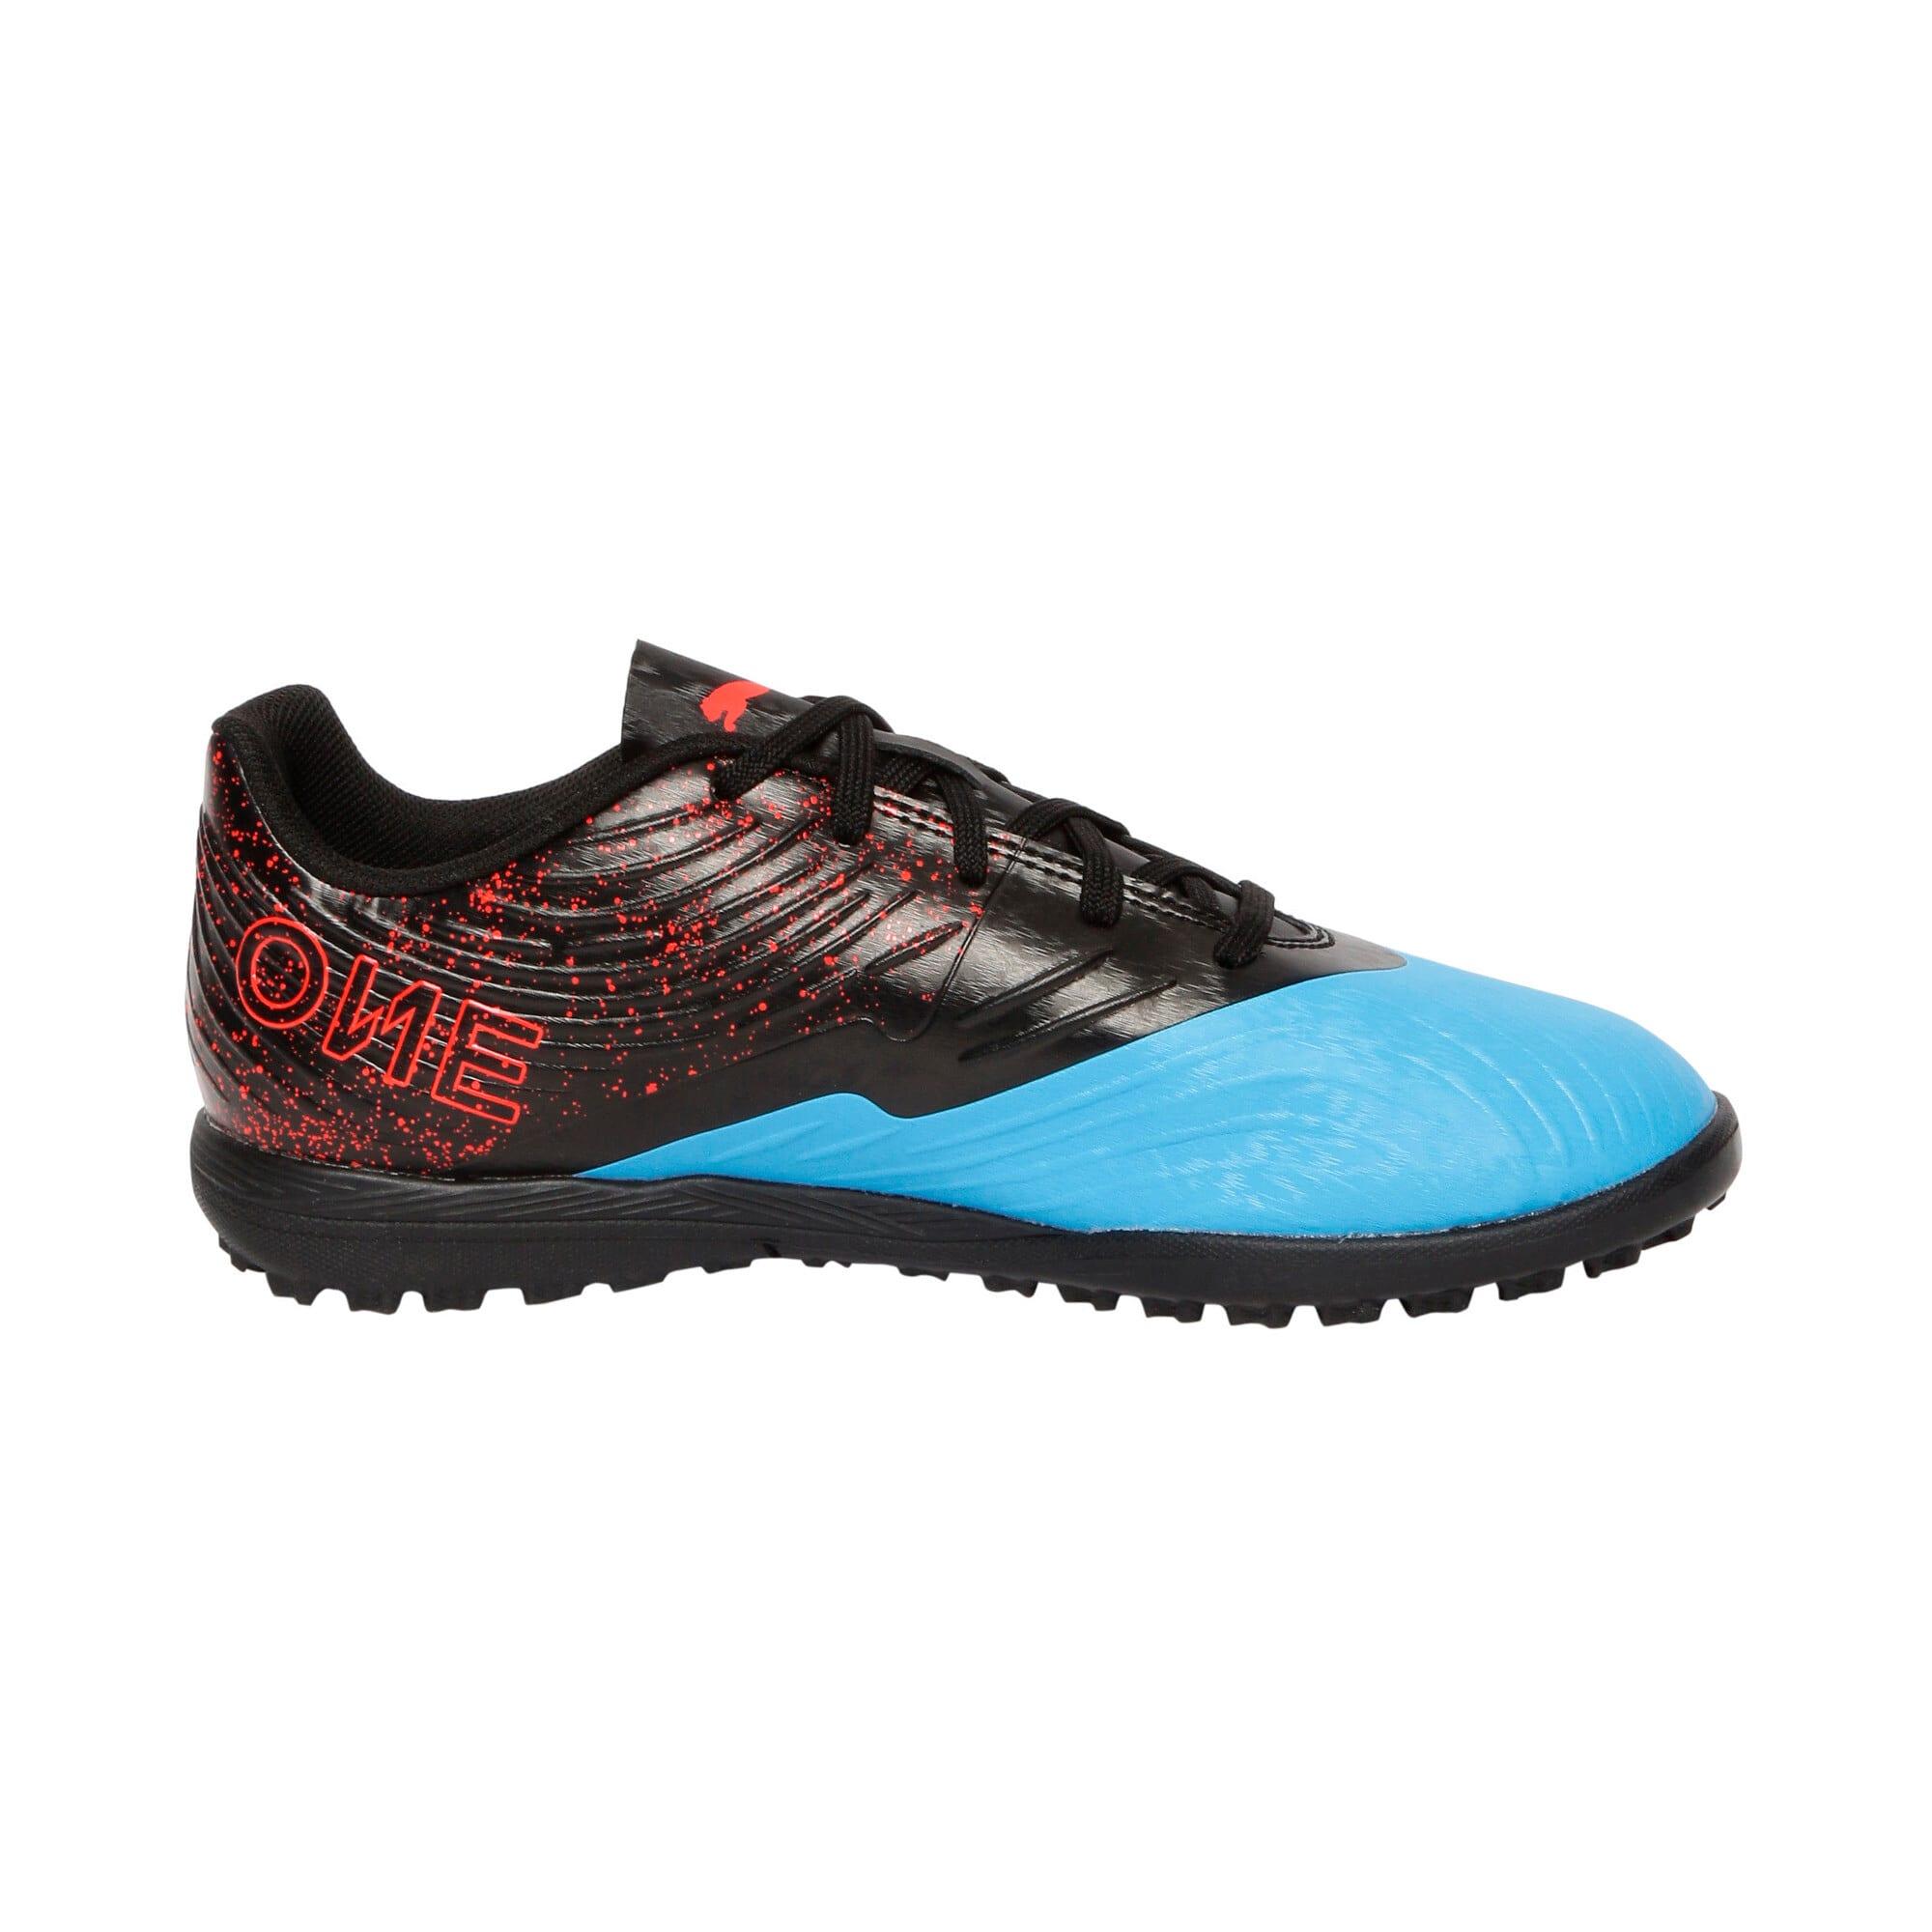 Thumbnail 5 of PUMA ONE 19.4 TT Youth Football Boots, Bleu Azur-Red Blast-Black, medium-IND